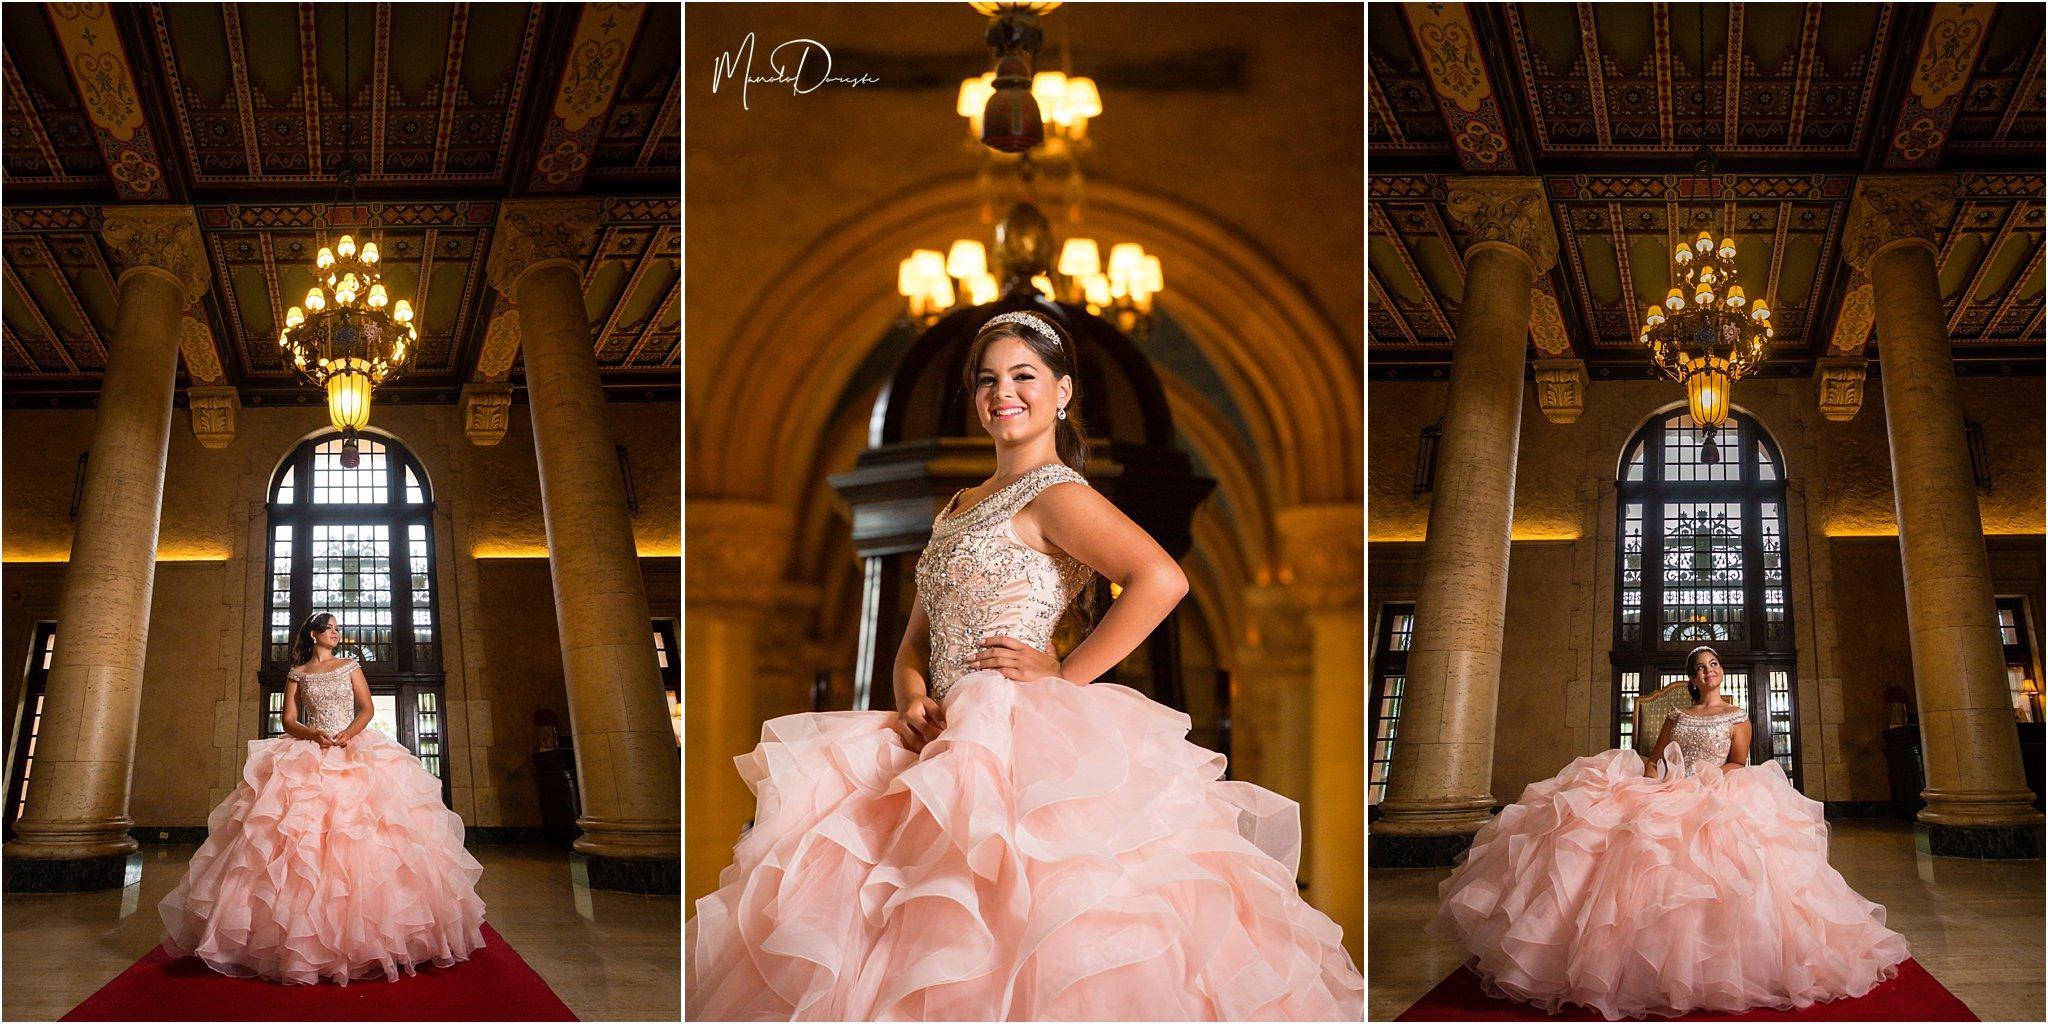 0348_ManoloDoreste_InFocusStudios_Wedding_Family_Photography_Miami_MiamiPhotographer.jpg